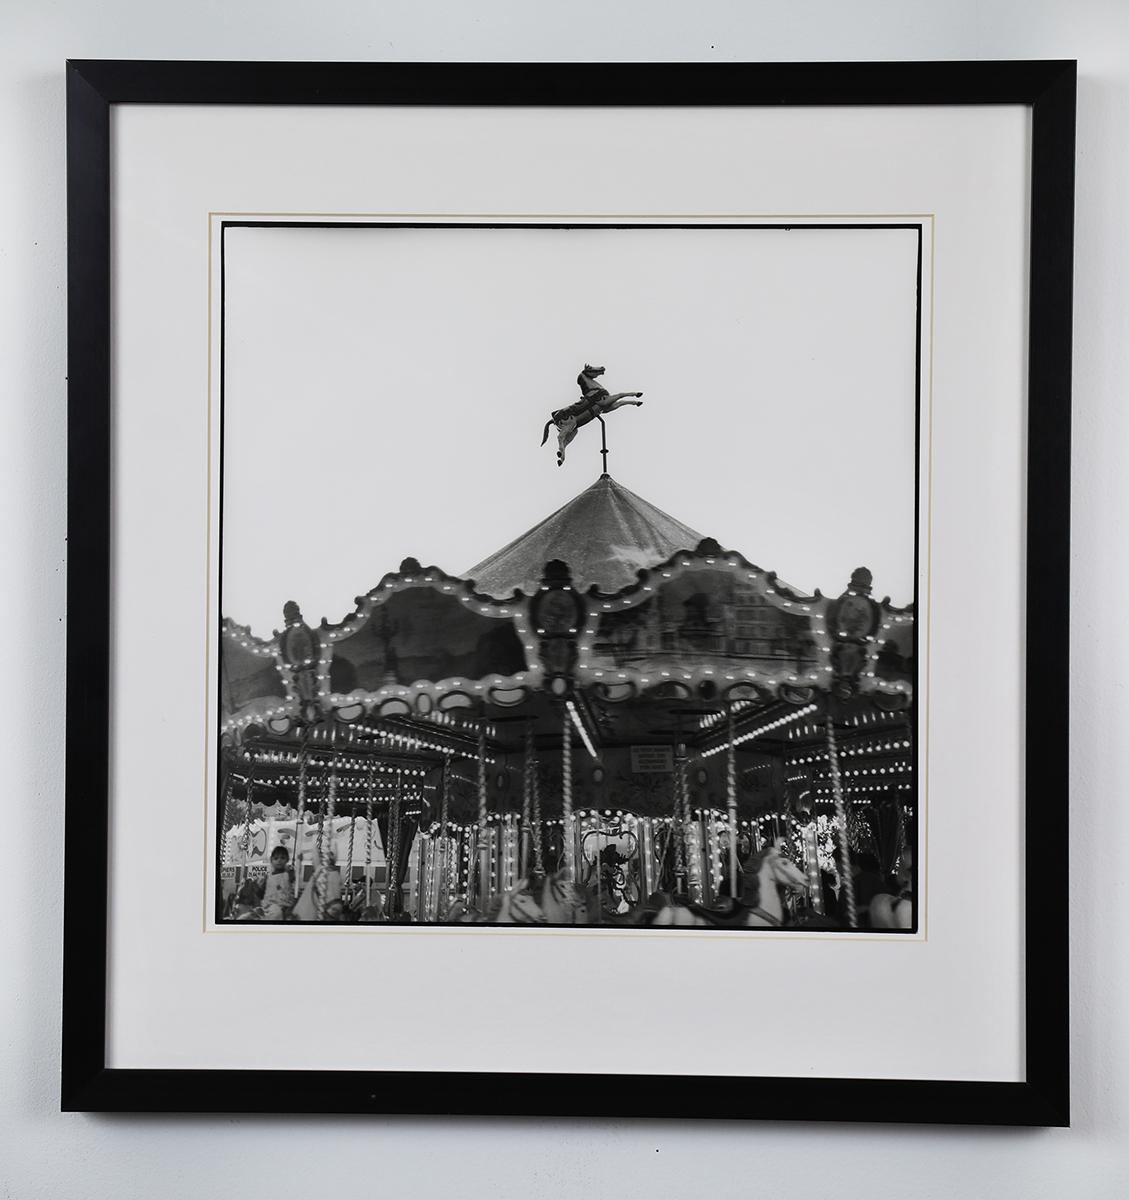 Ian-Mcfarlane-Paris-_-21_X-22_-_-Silver-Print-photography